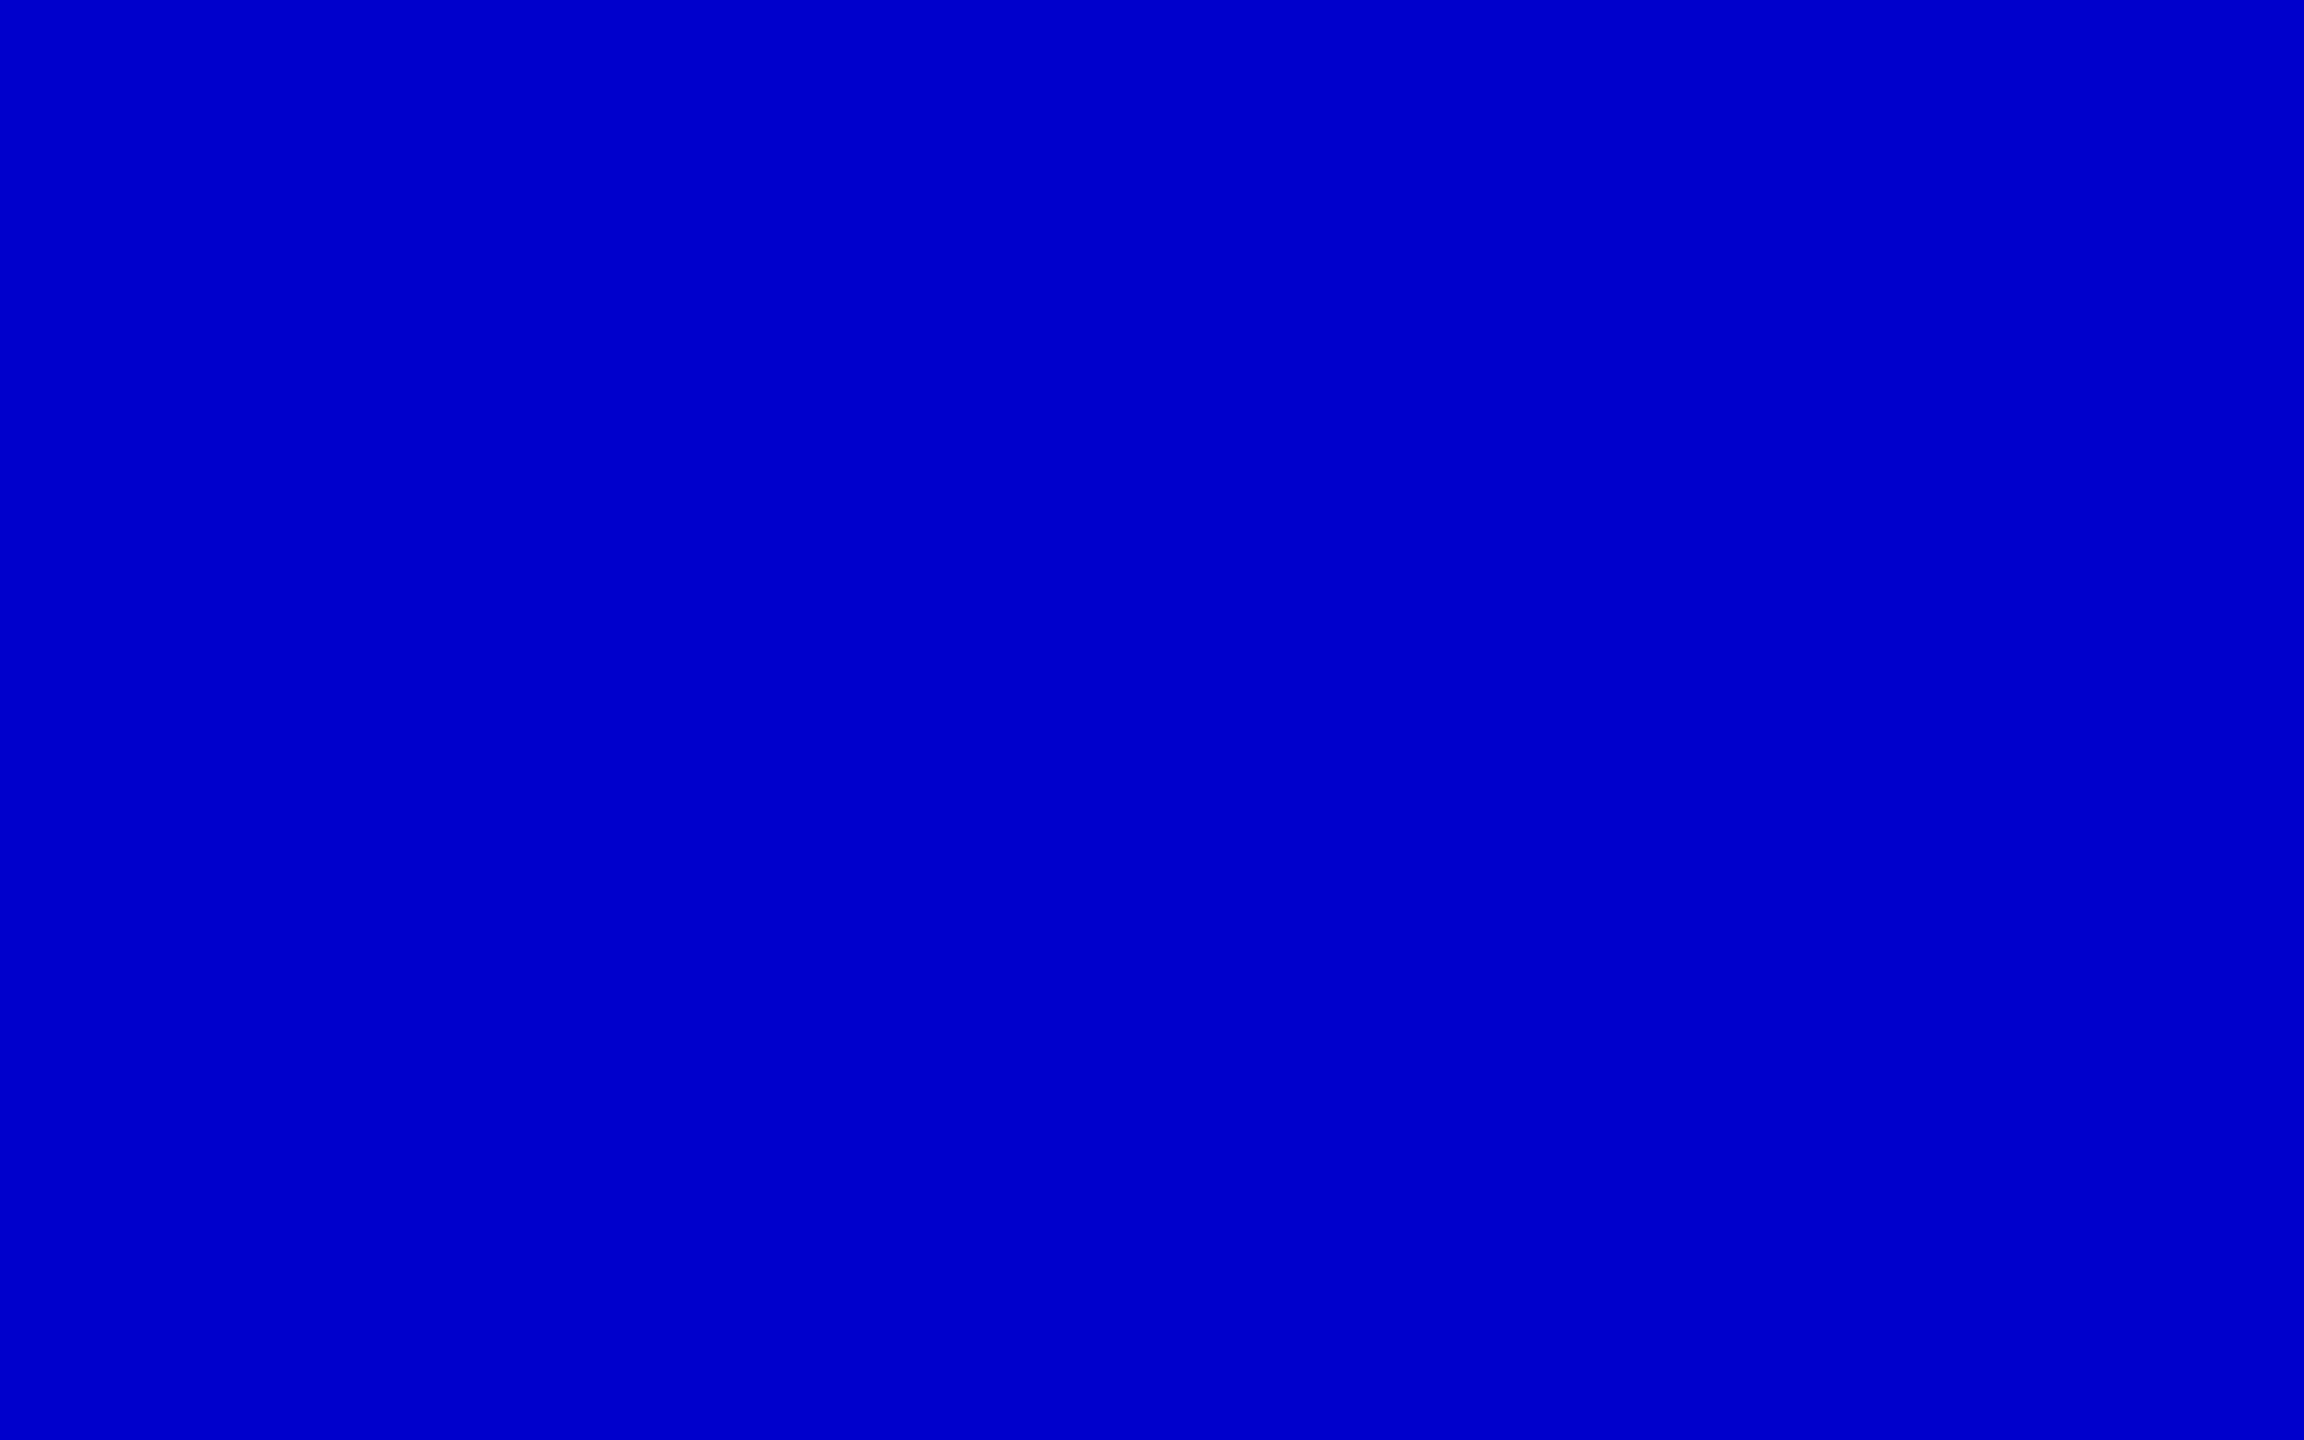 2304x1440 Medium Blue Solid Color Background